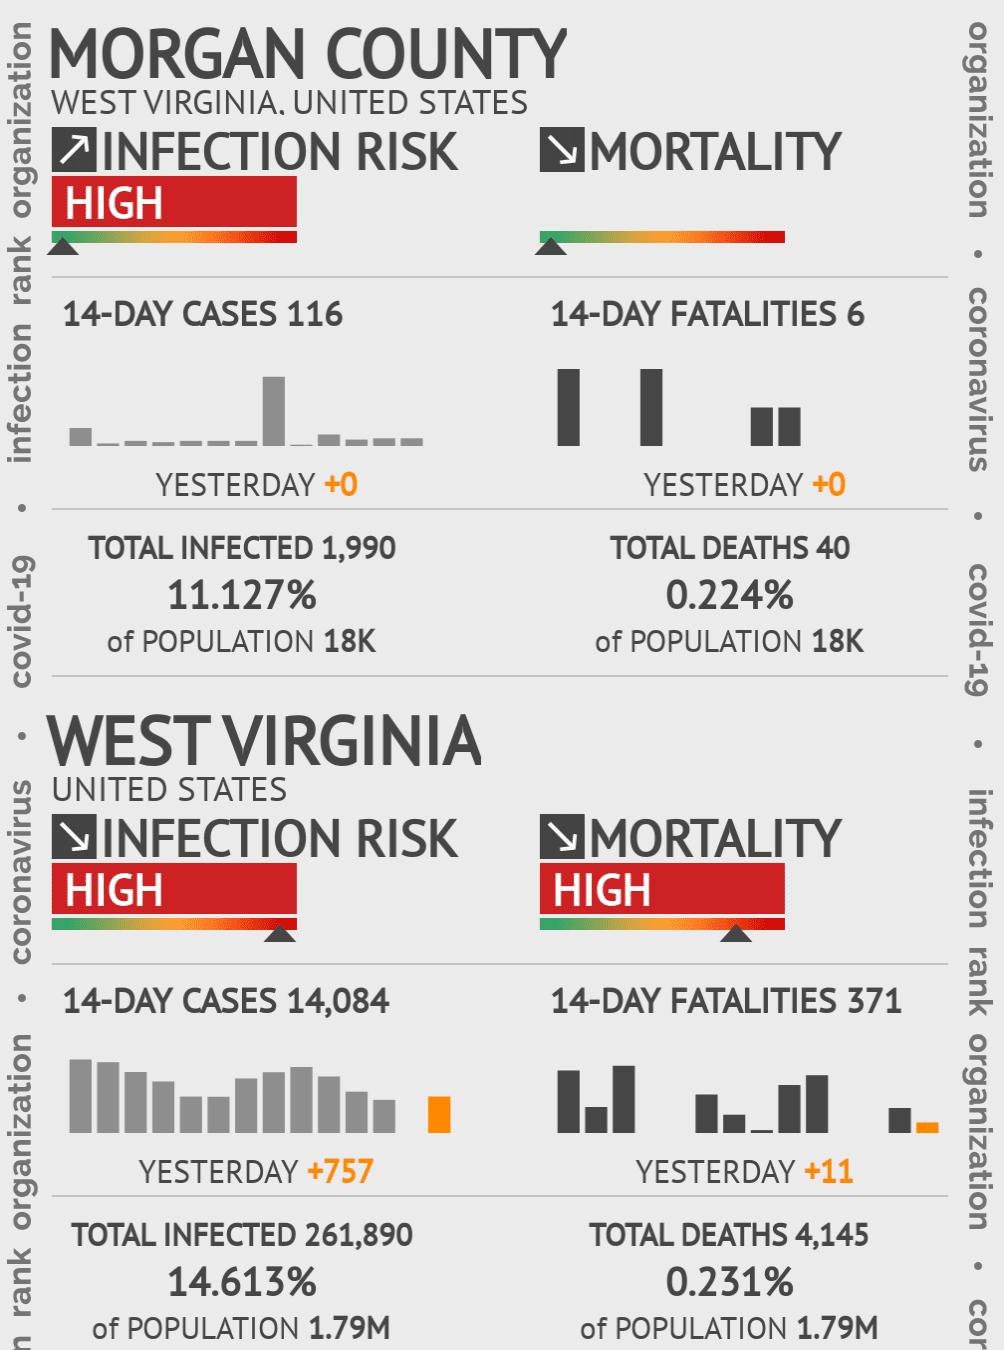 Morgan County Coronavirus Covid-19 Risk of Infection on March 05, 2021